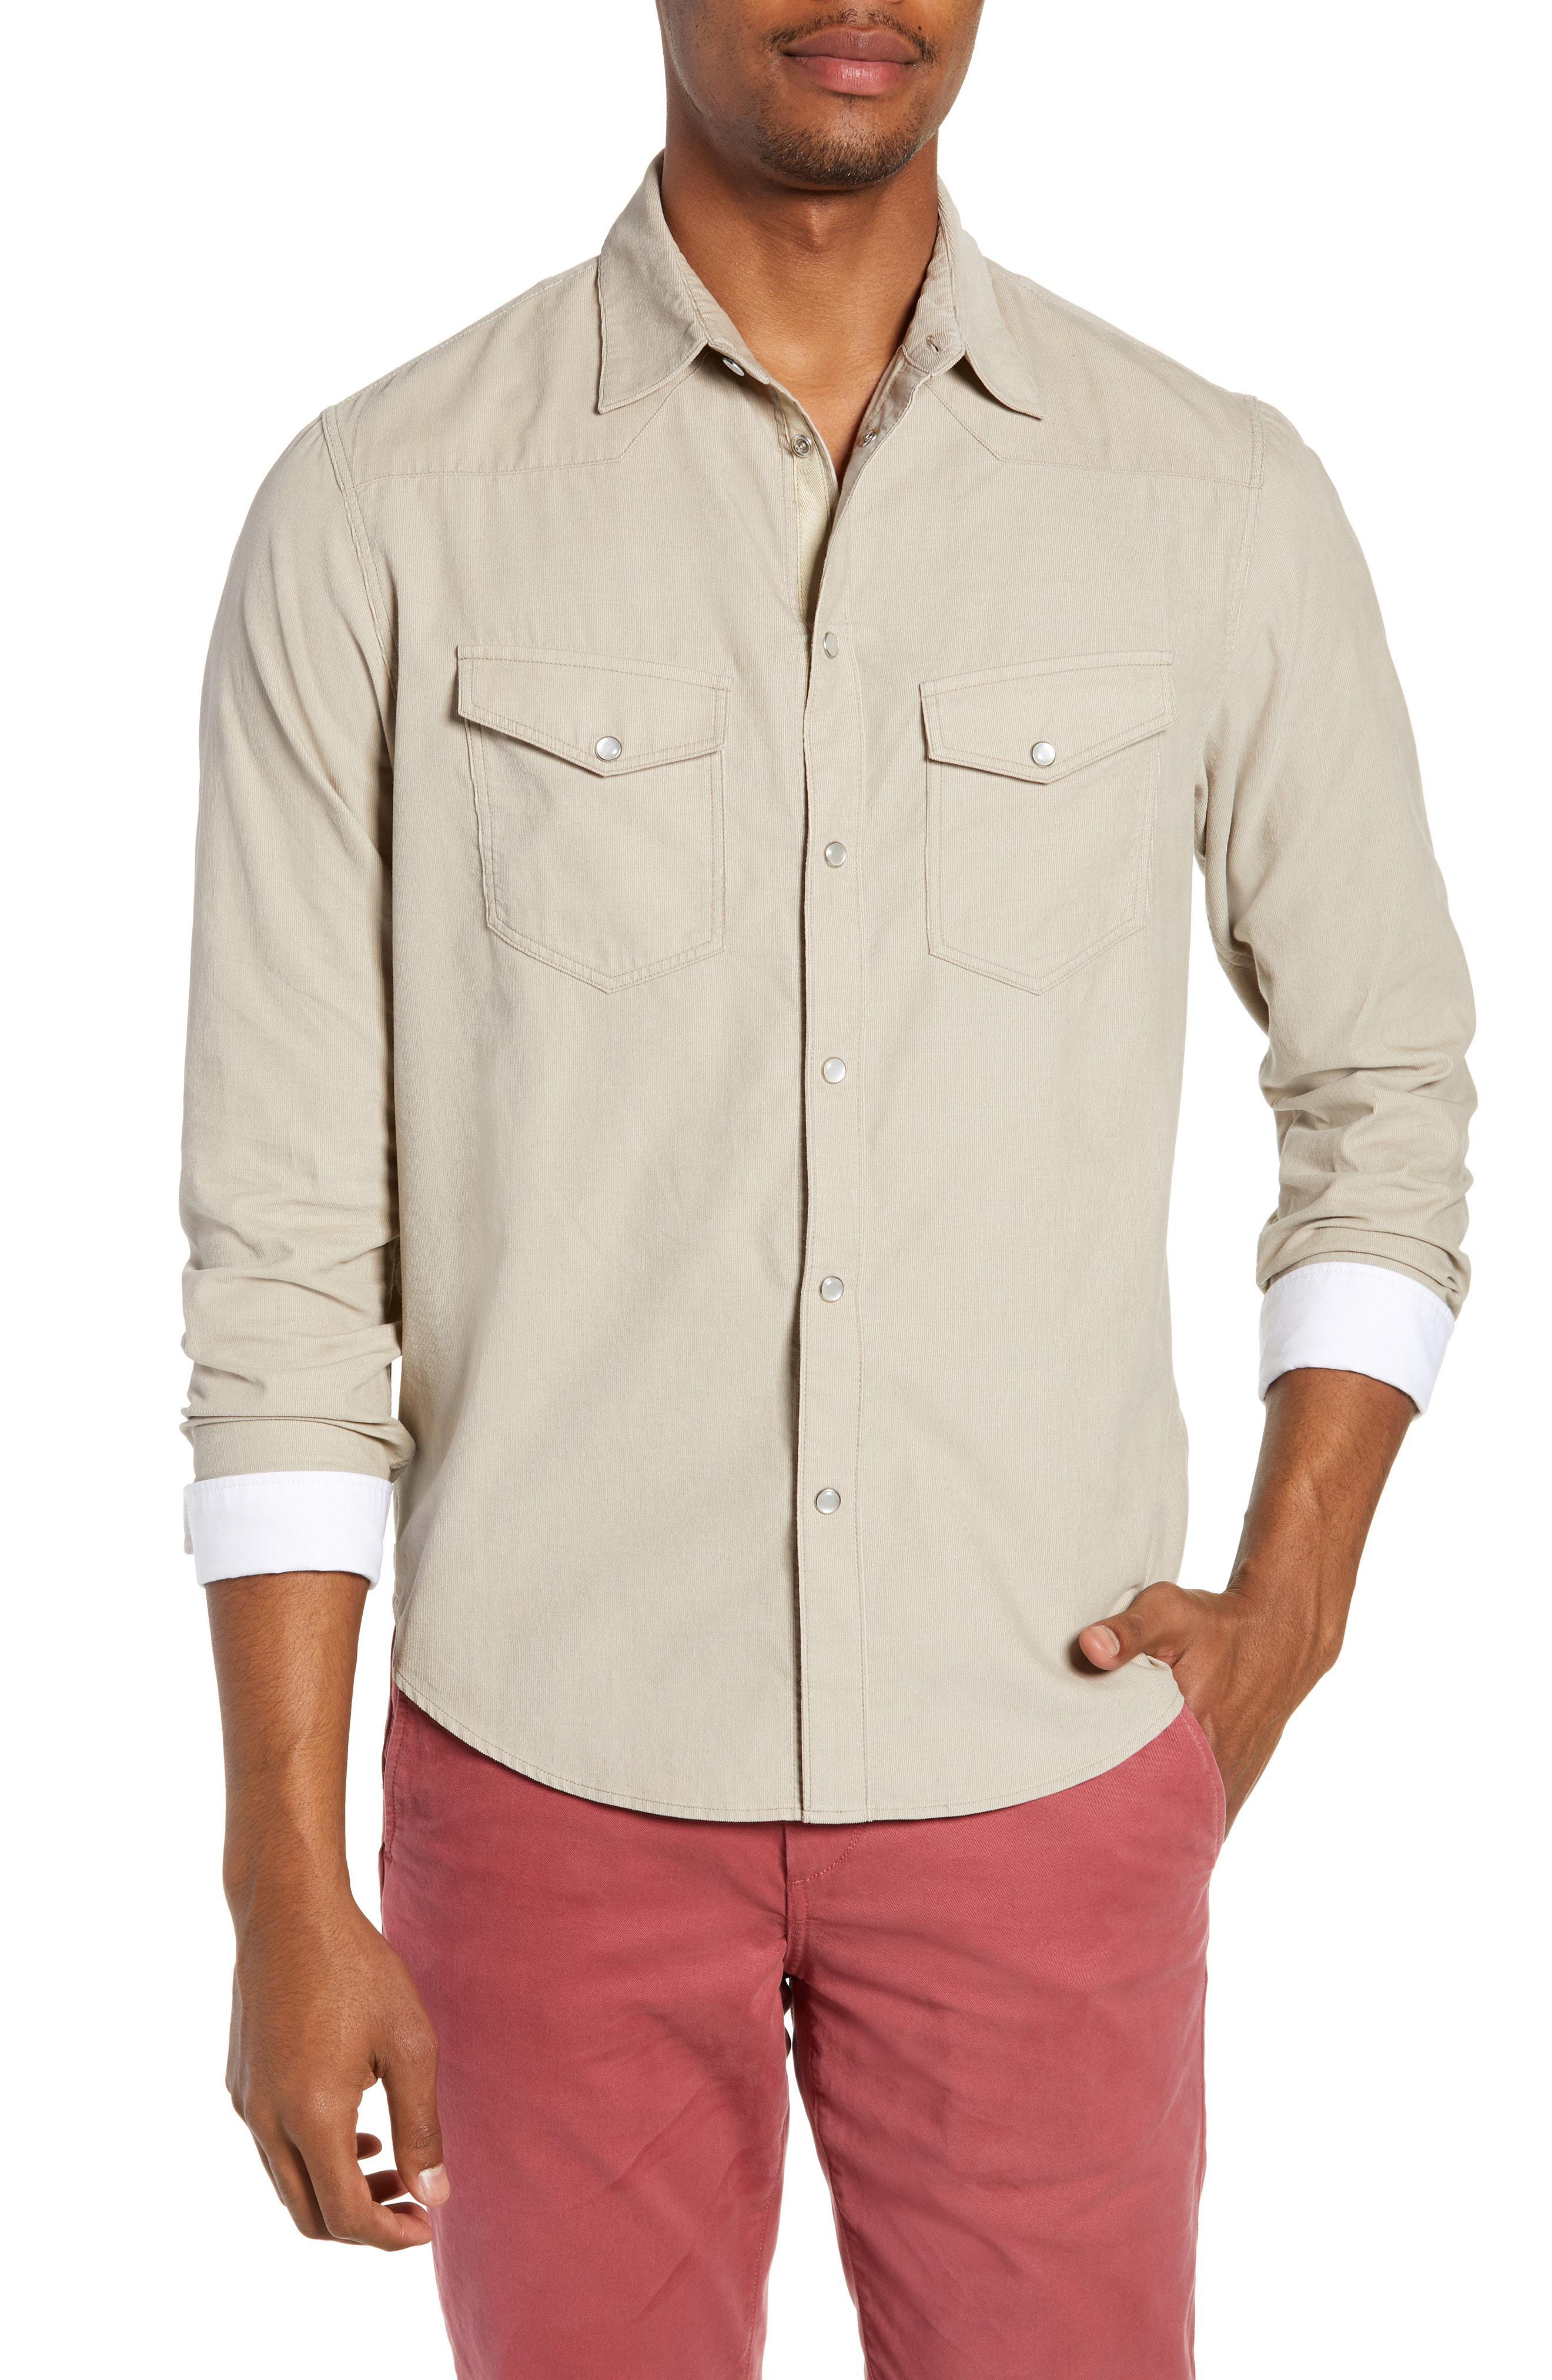 8a672614 Lyst - Rag & Bone Beck Slim Fit Corduroy Sport Shirt in Natural for Men